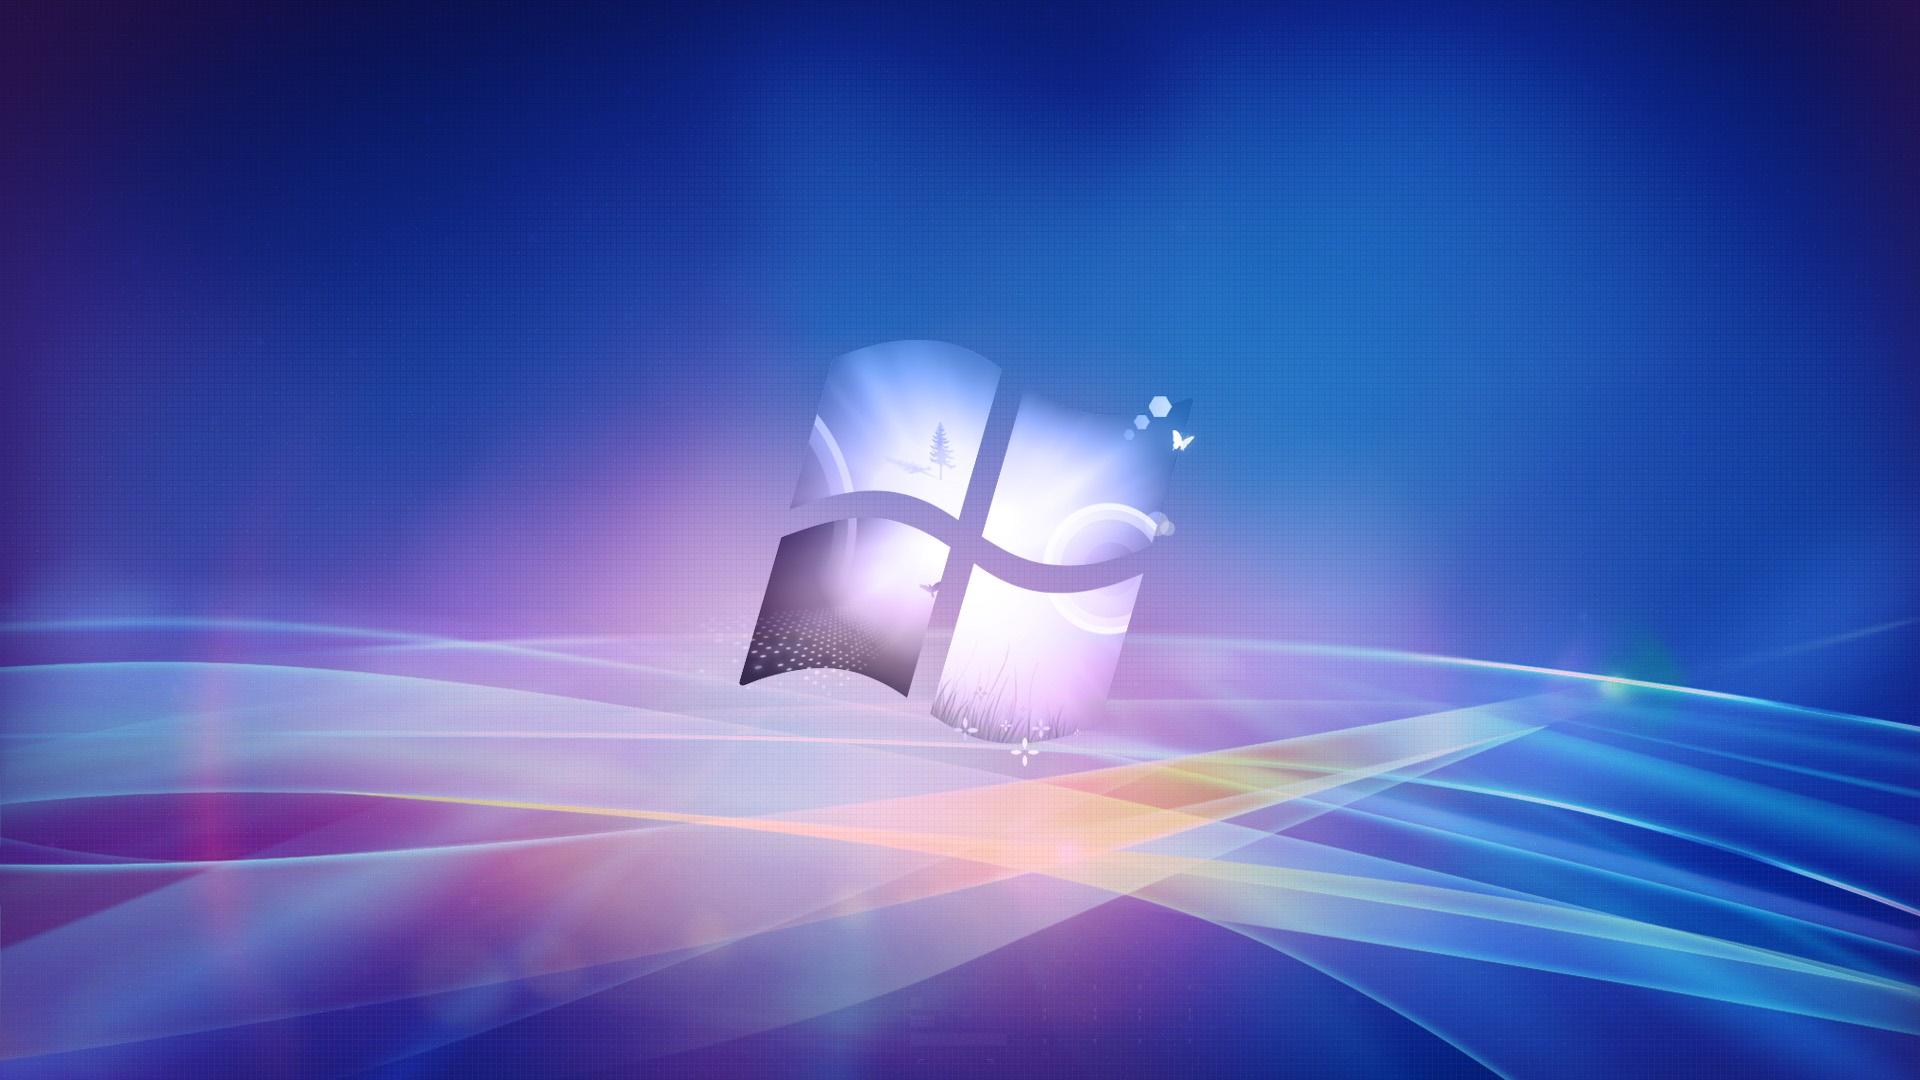 Windows徽標,創意設計的背景 電腦桌布   1920x1080 桌布下載   HK.HDWALL365.com